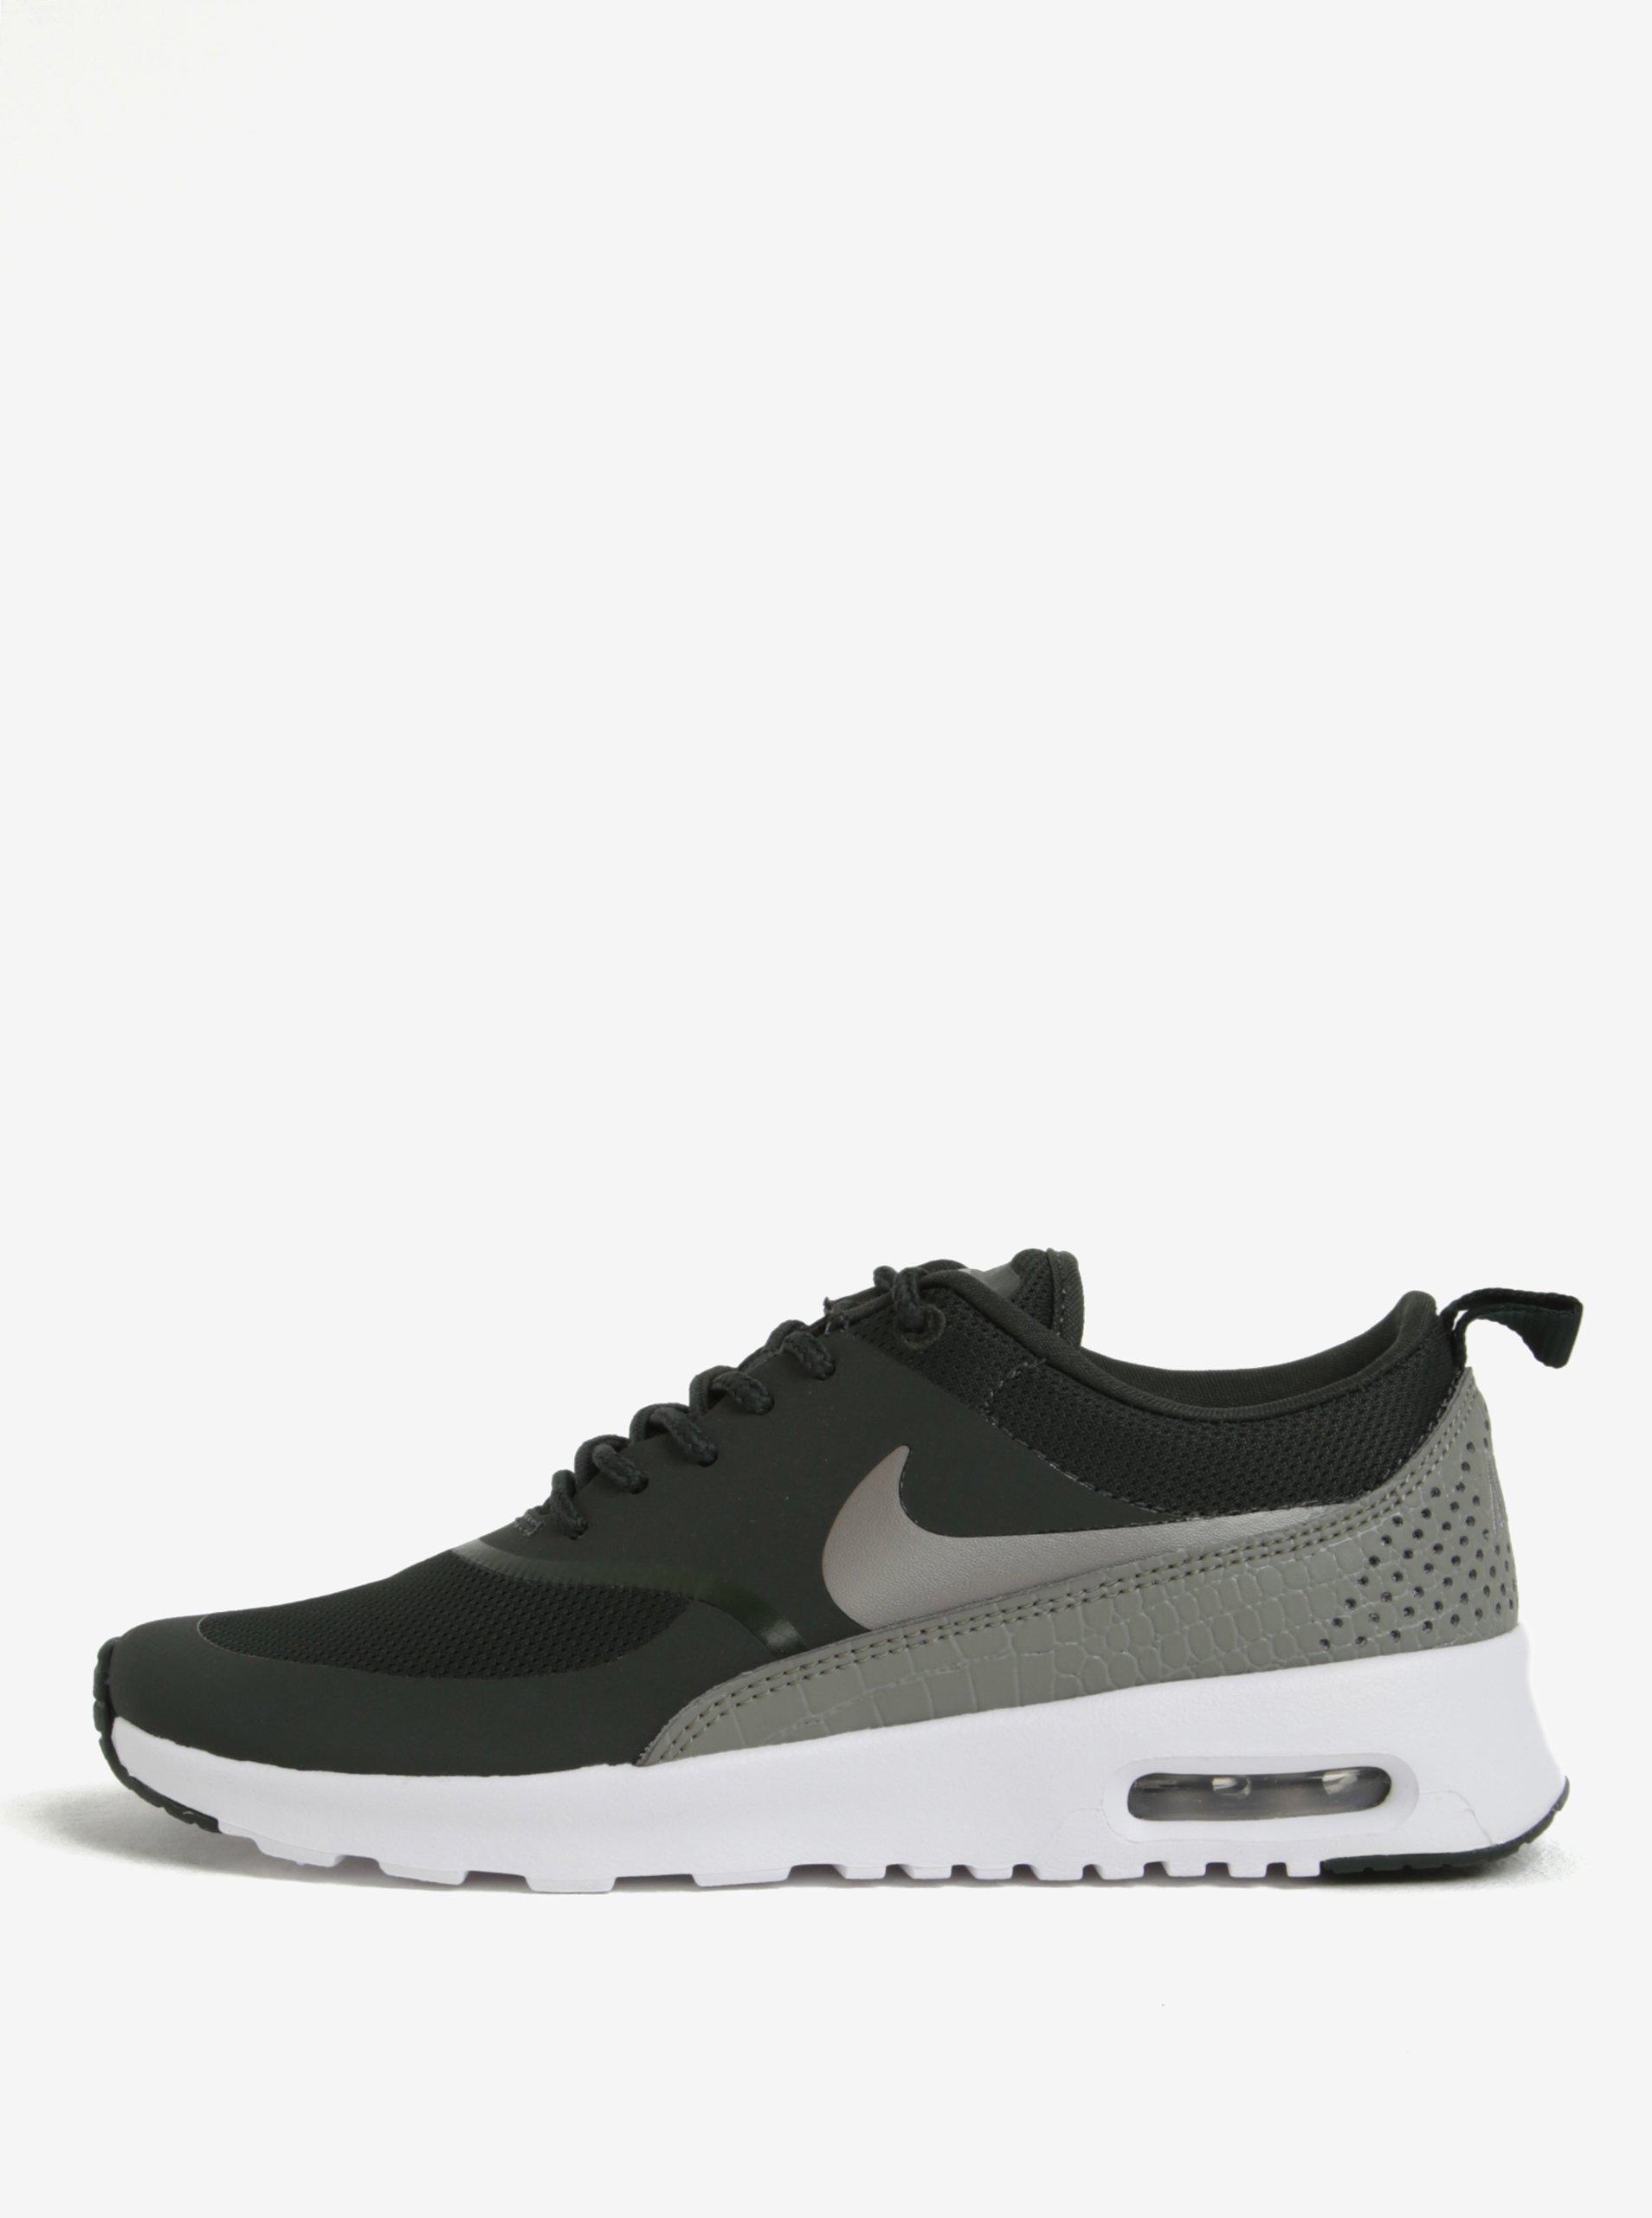 3dd97edae1df3 Nike air max thea topanky damske white | Stojizato.sme.sk